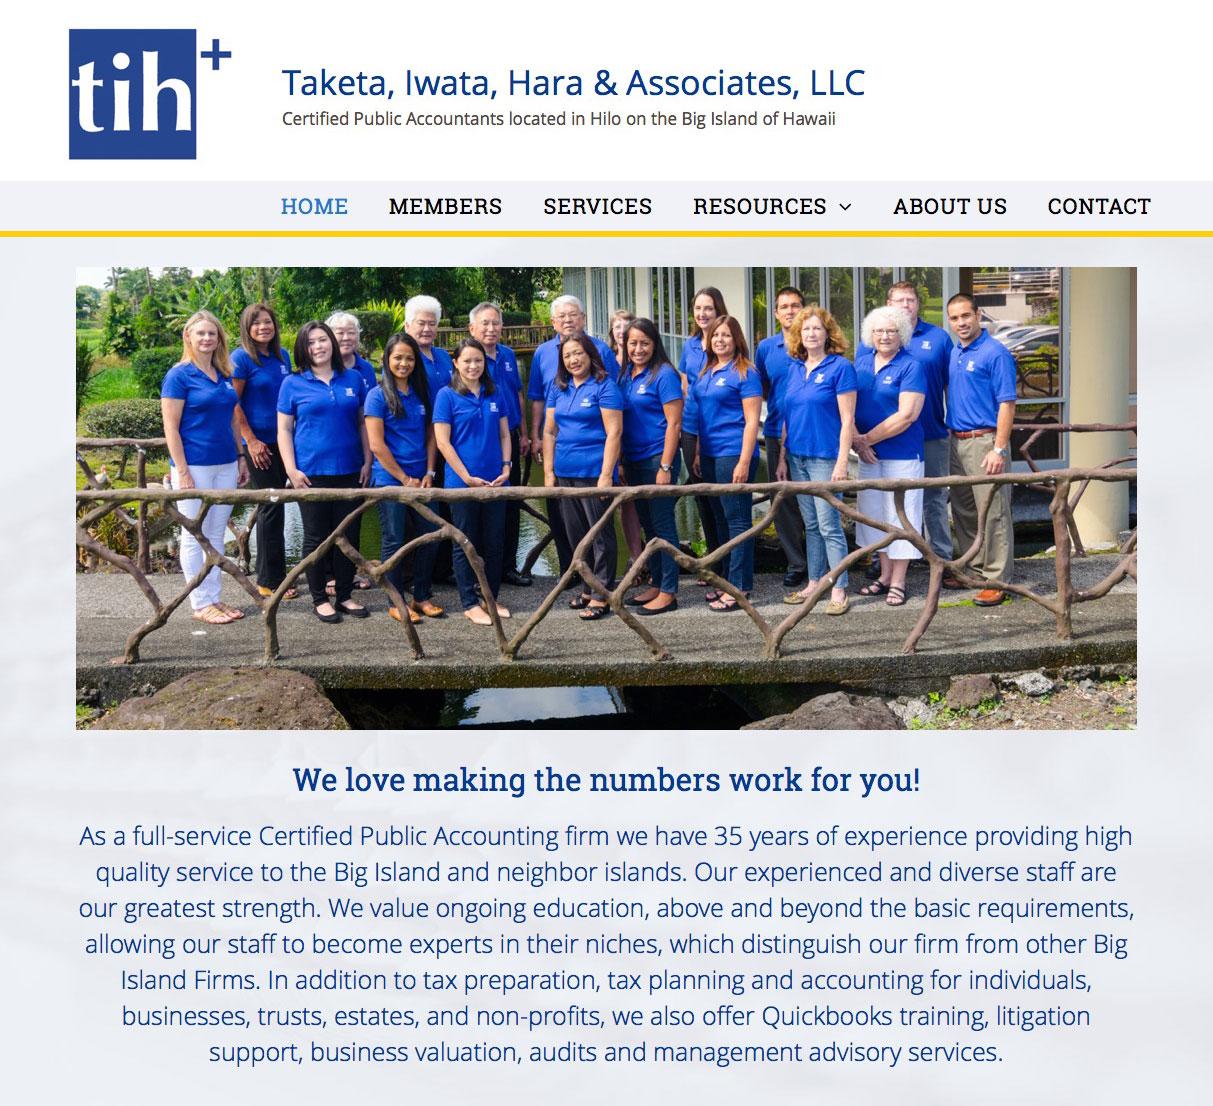 Taketa, Iwata, Hara & Associates, LLC